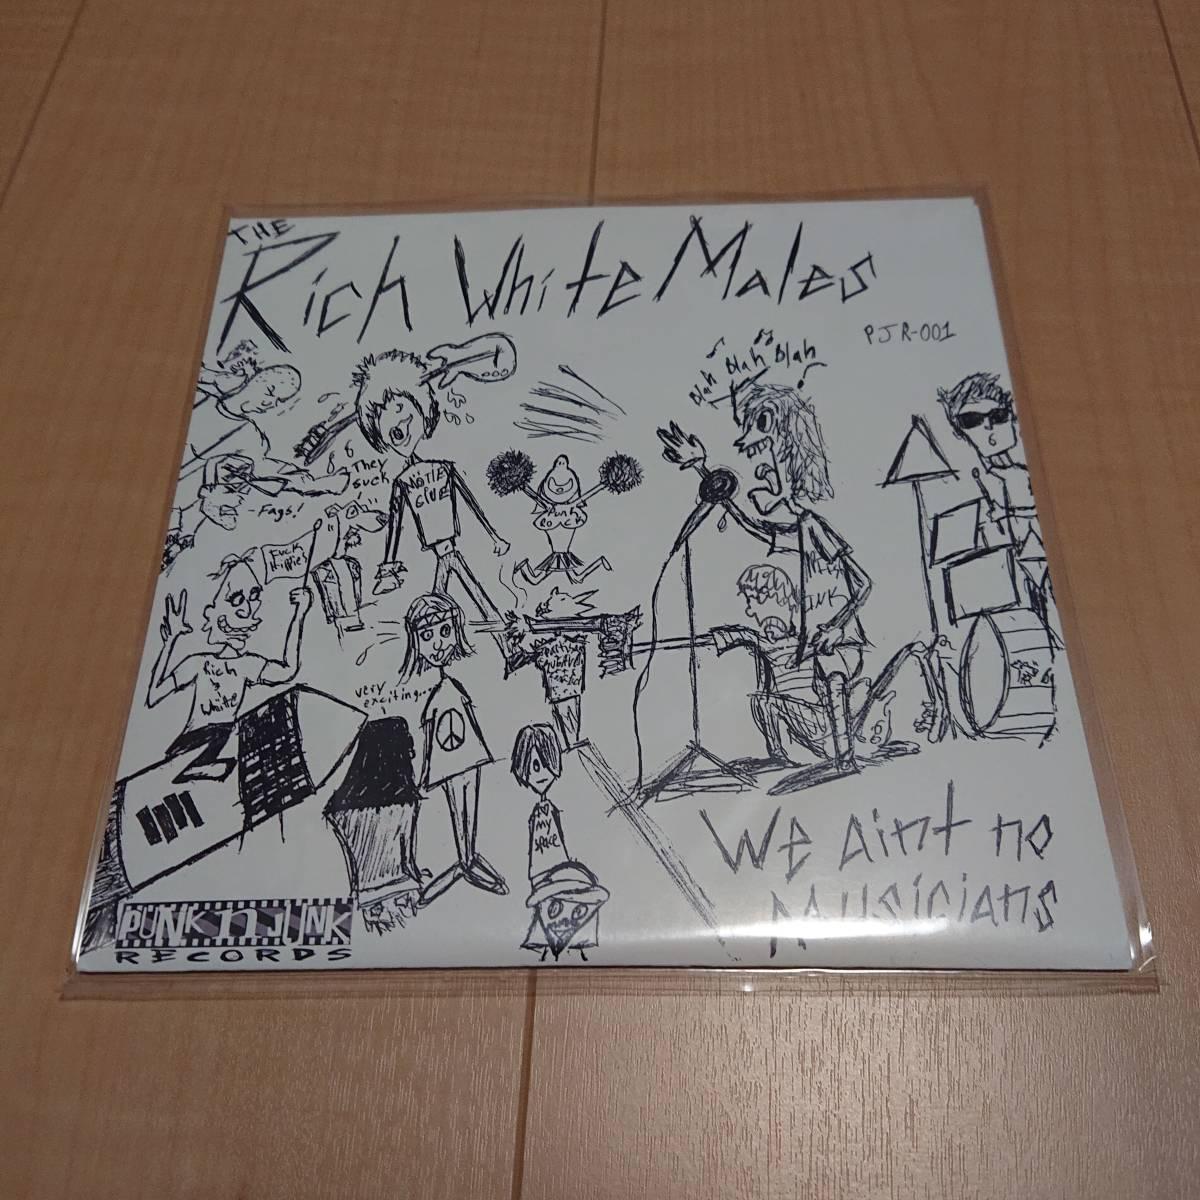 【The Rich White Males - We Aint No Musicians】queers dwarves pop punk